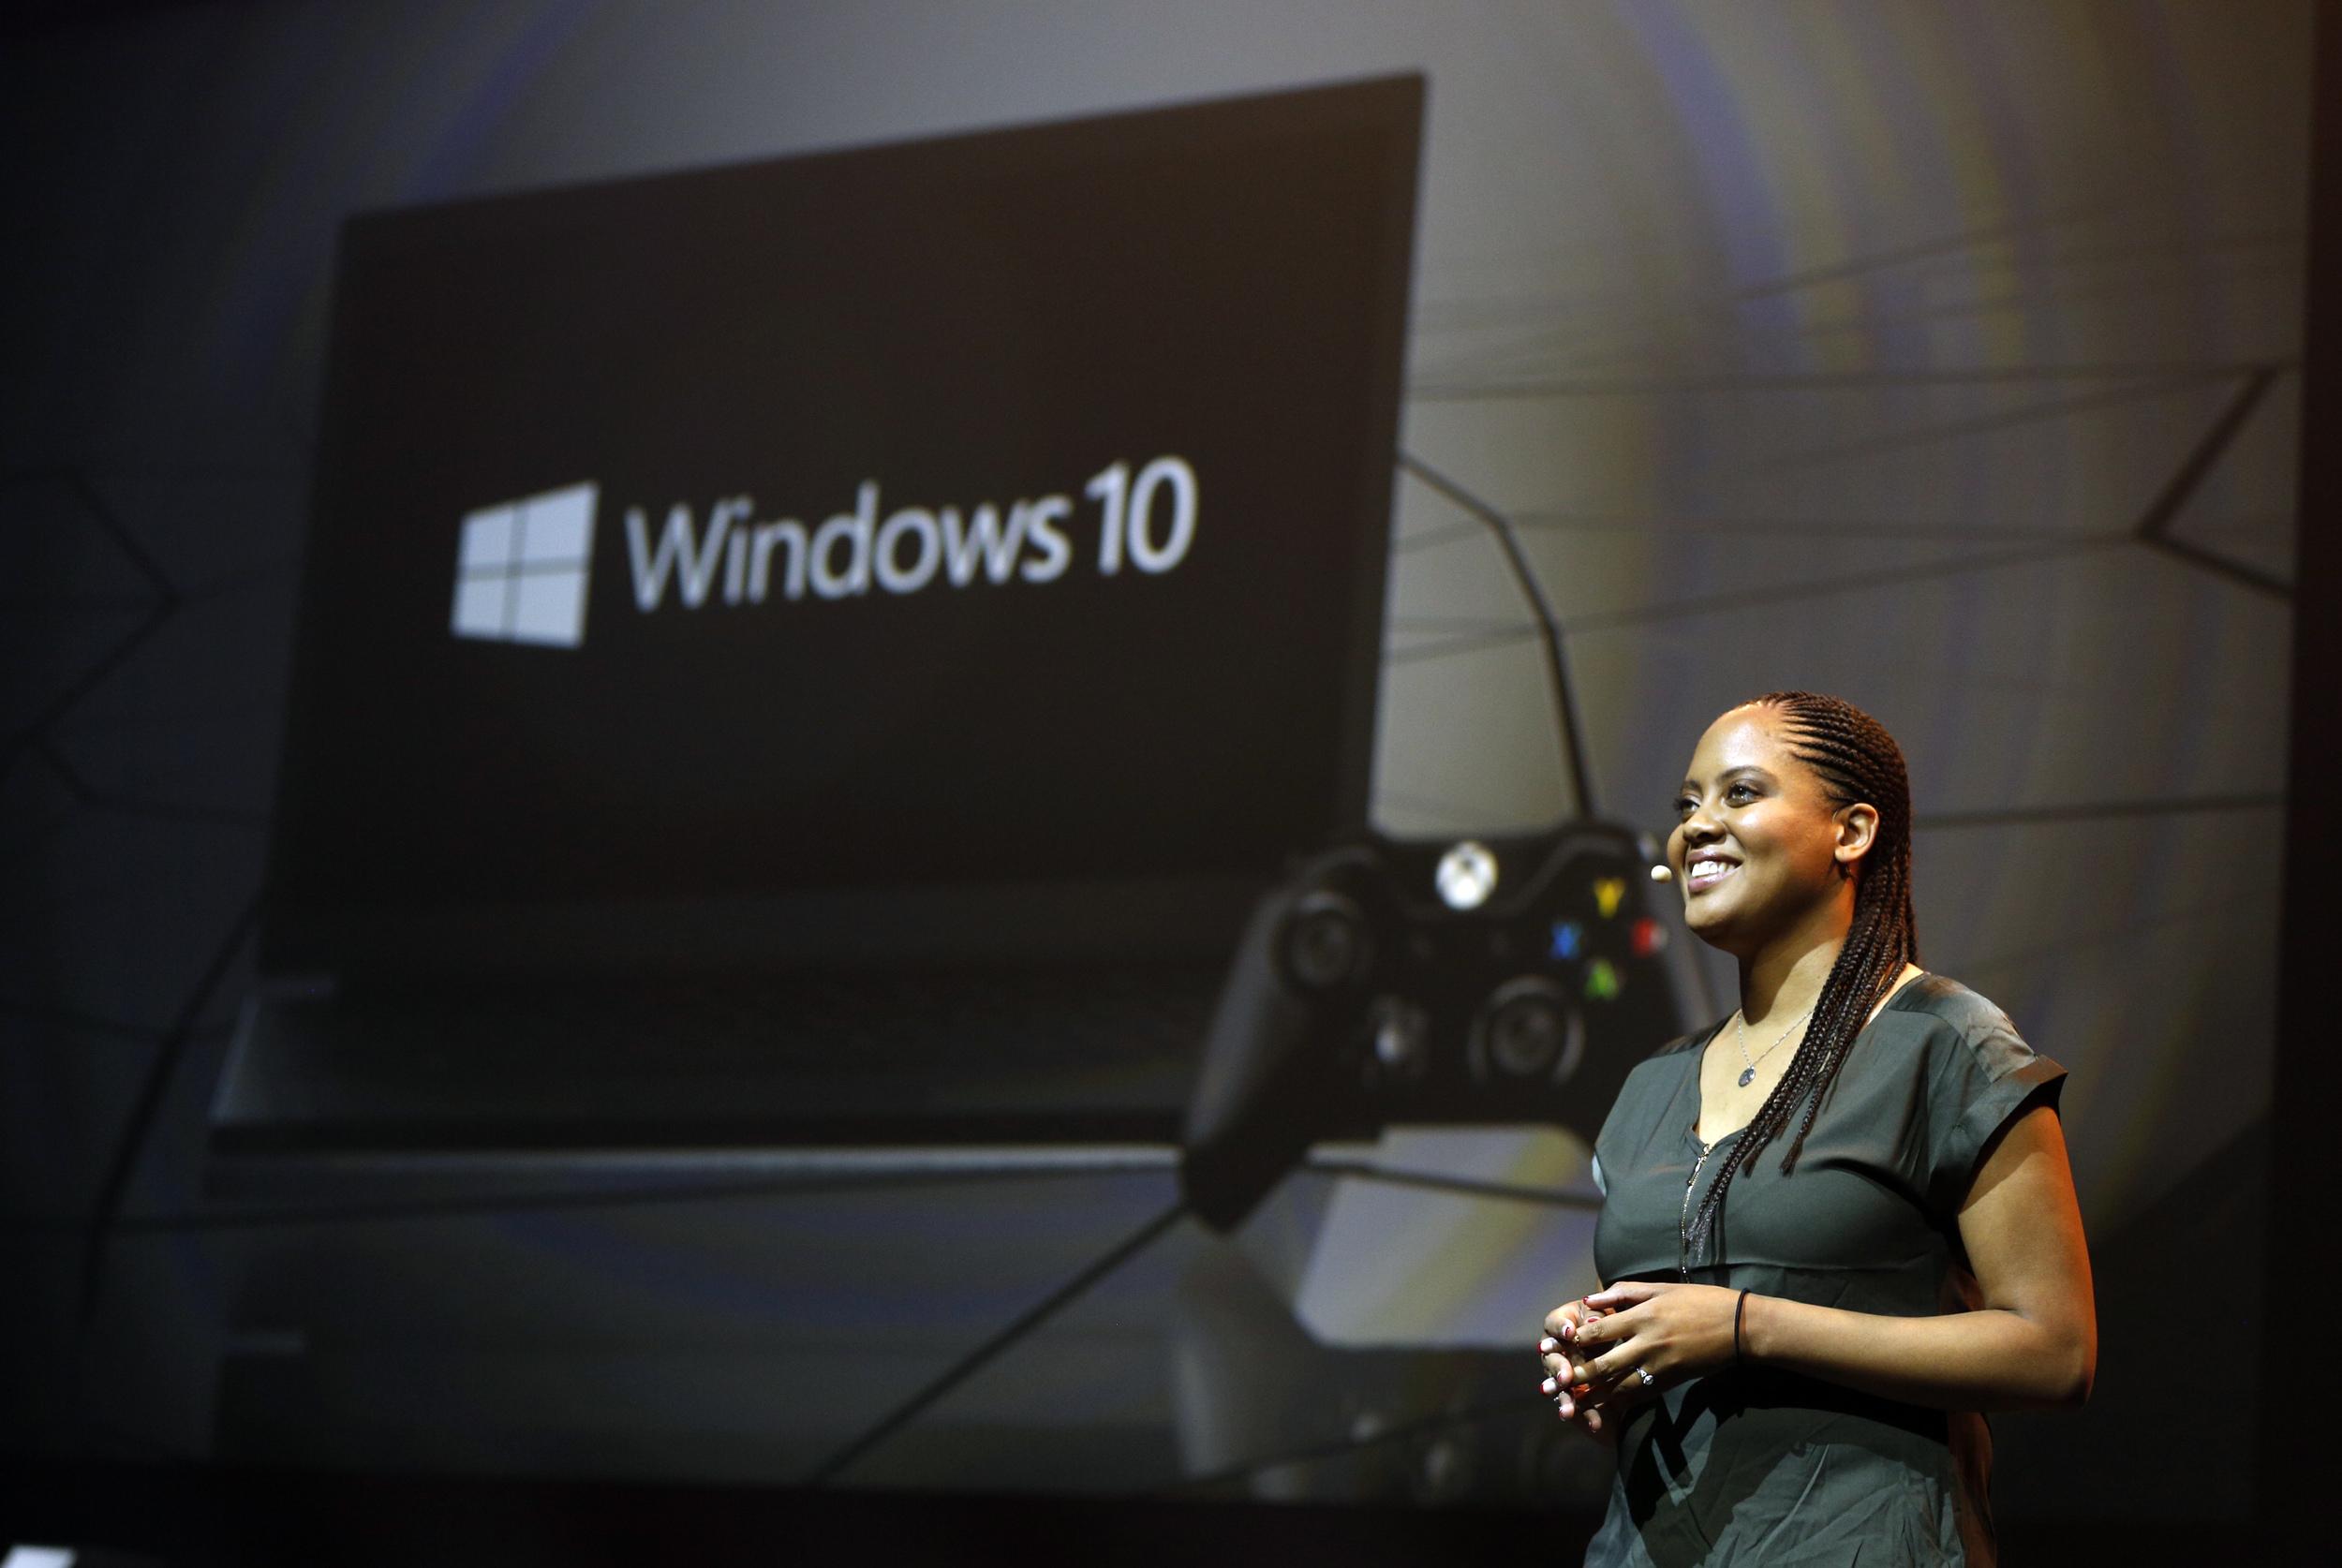 Xbox-gamescom-Briefing-2015-Jasmine-Lawrence-Windows-10-Xbox-JPG.0.JPG